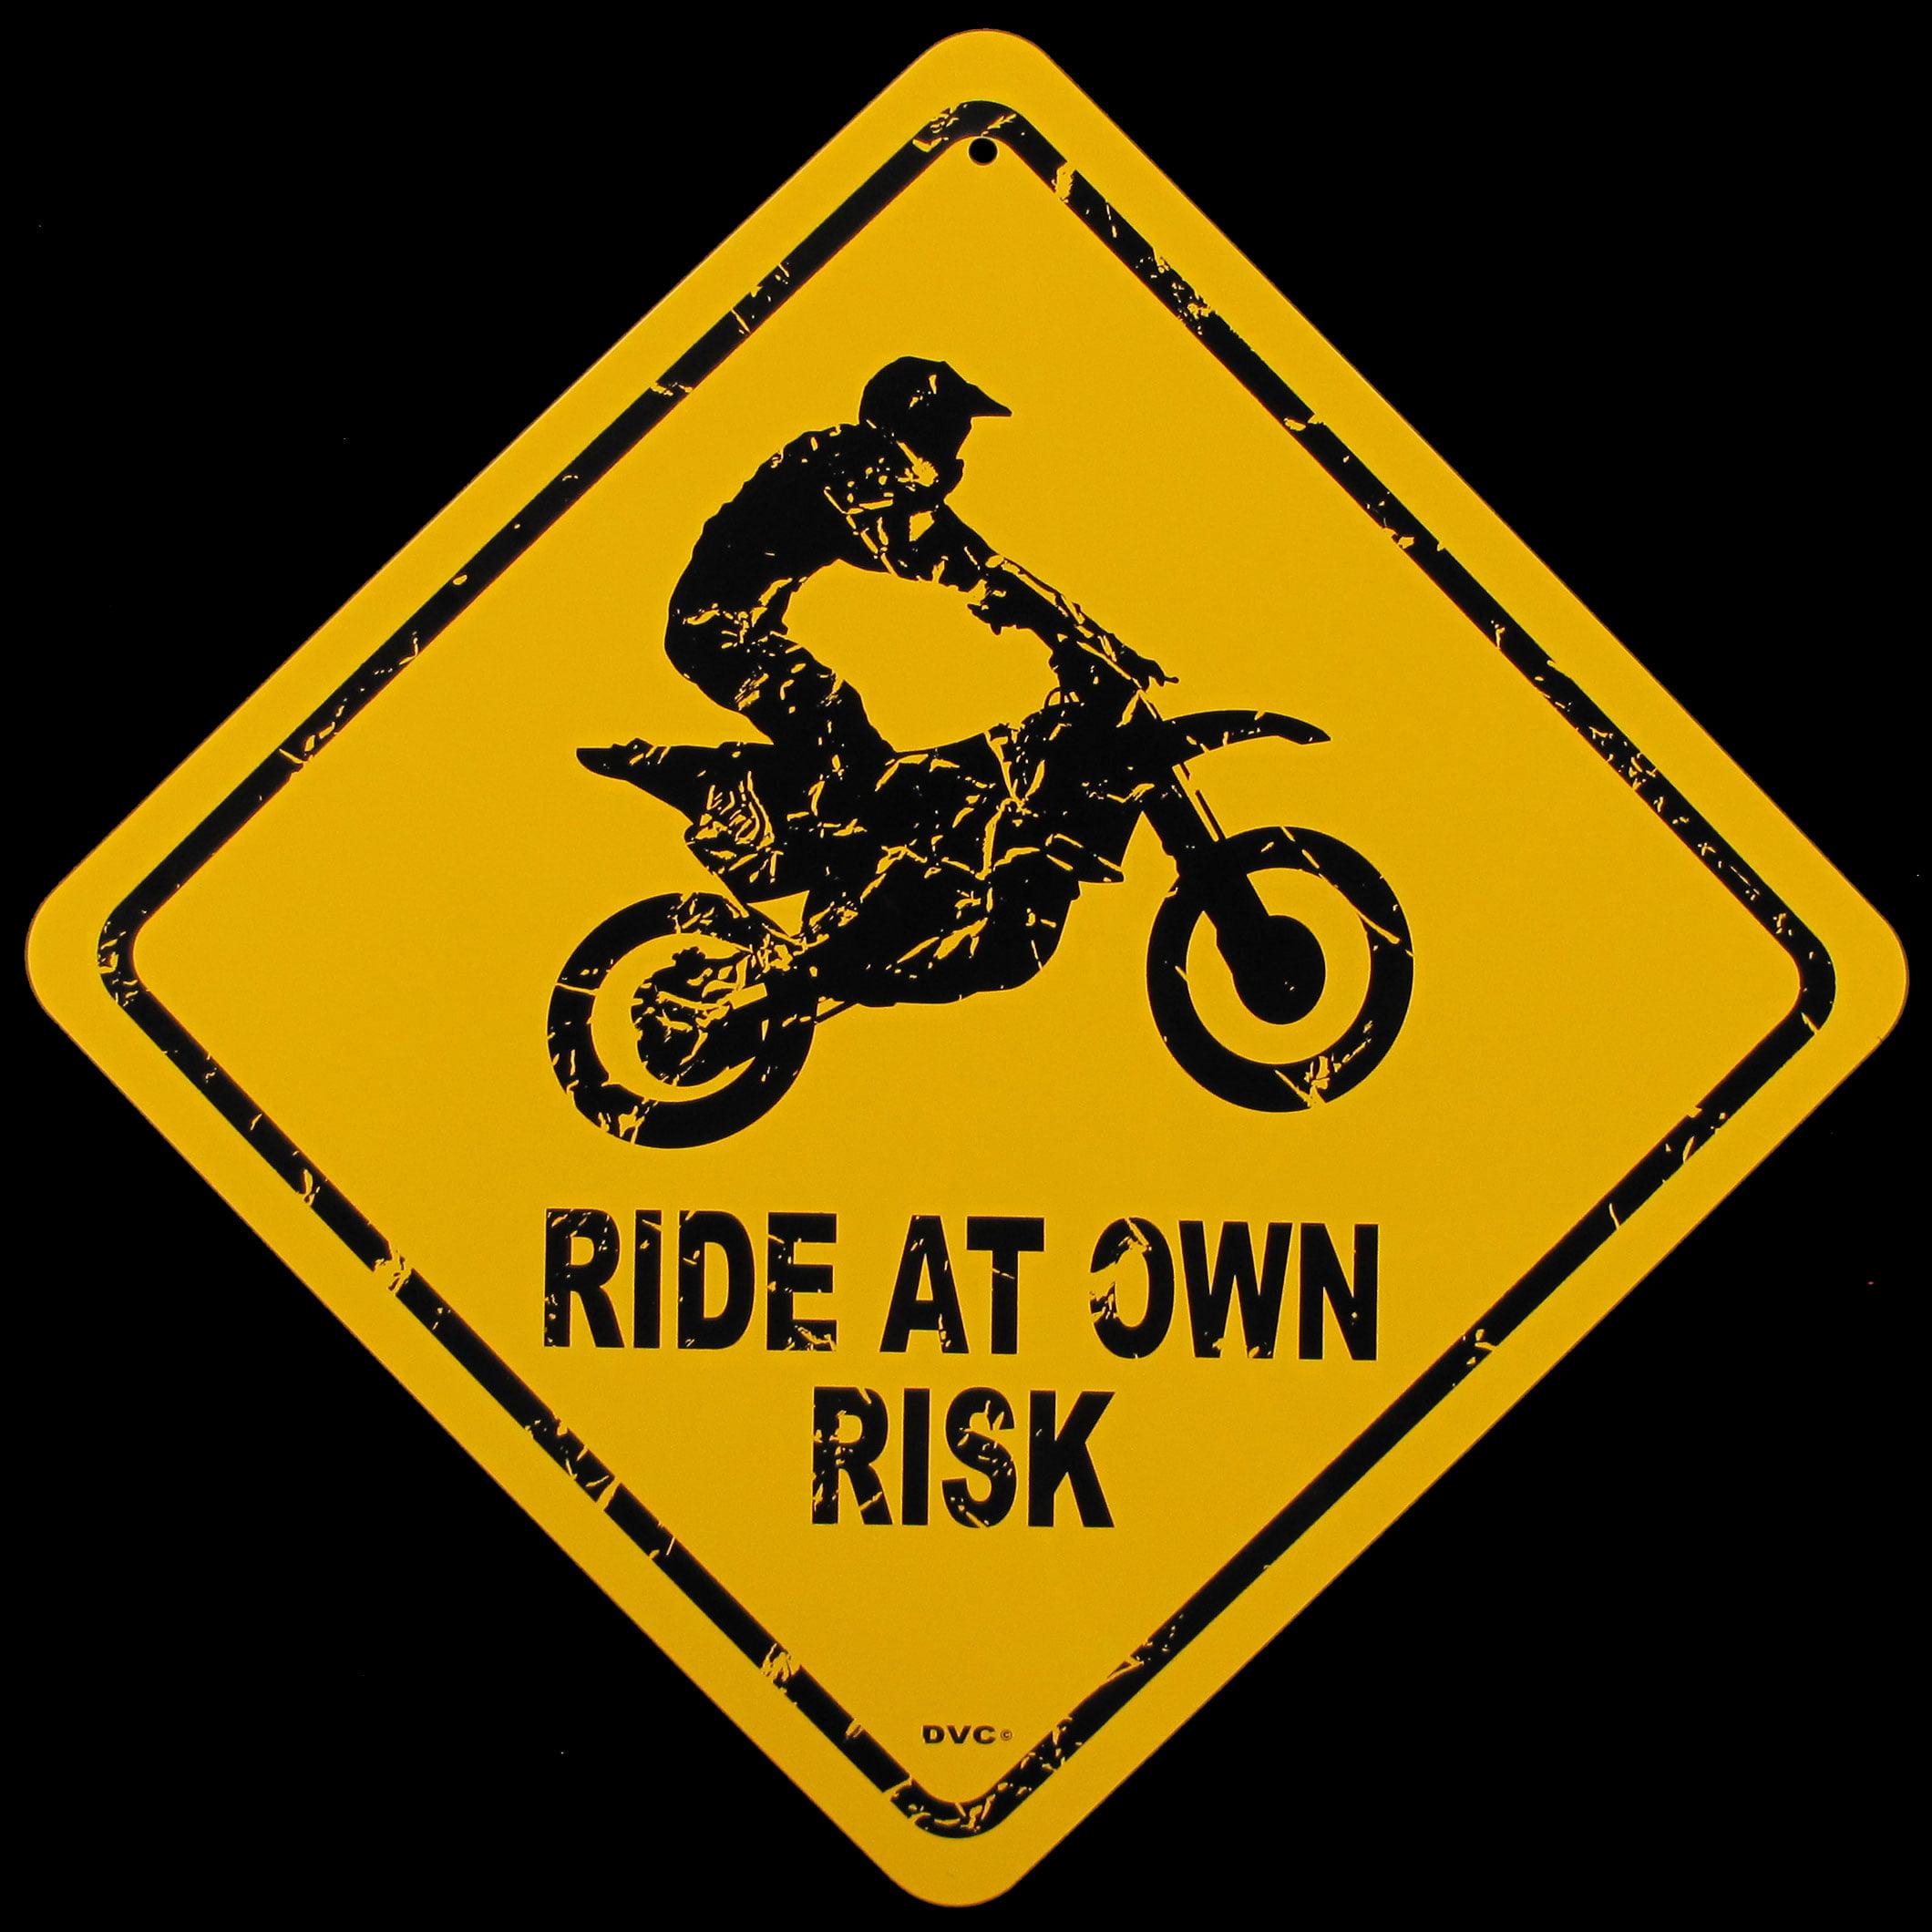 Caution Ride At Own Risk Enduro Trials Motocross Dirt Bike Metal Warning Sign Walmart Com Walmart Com